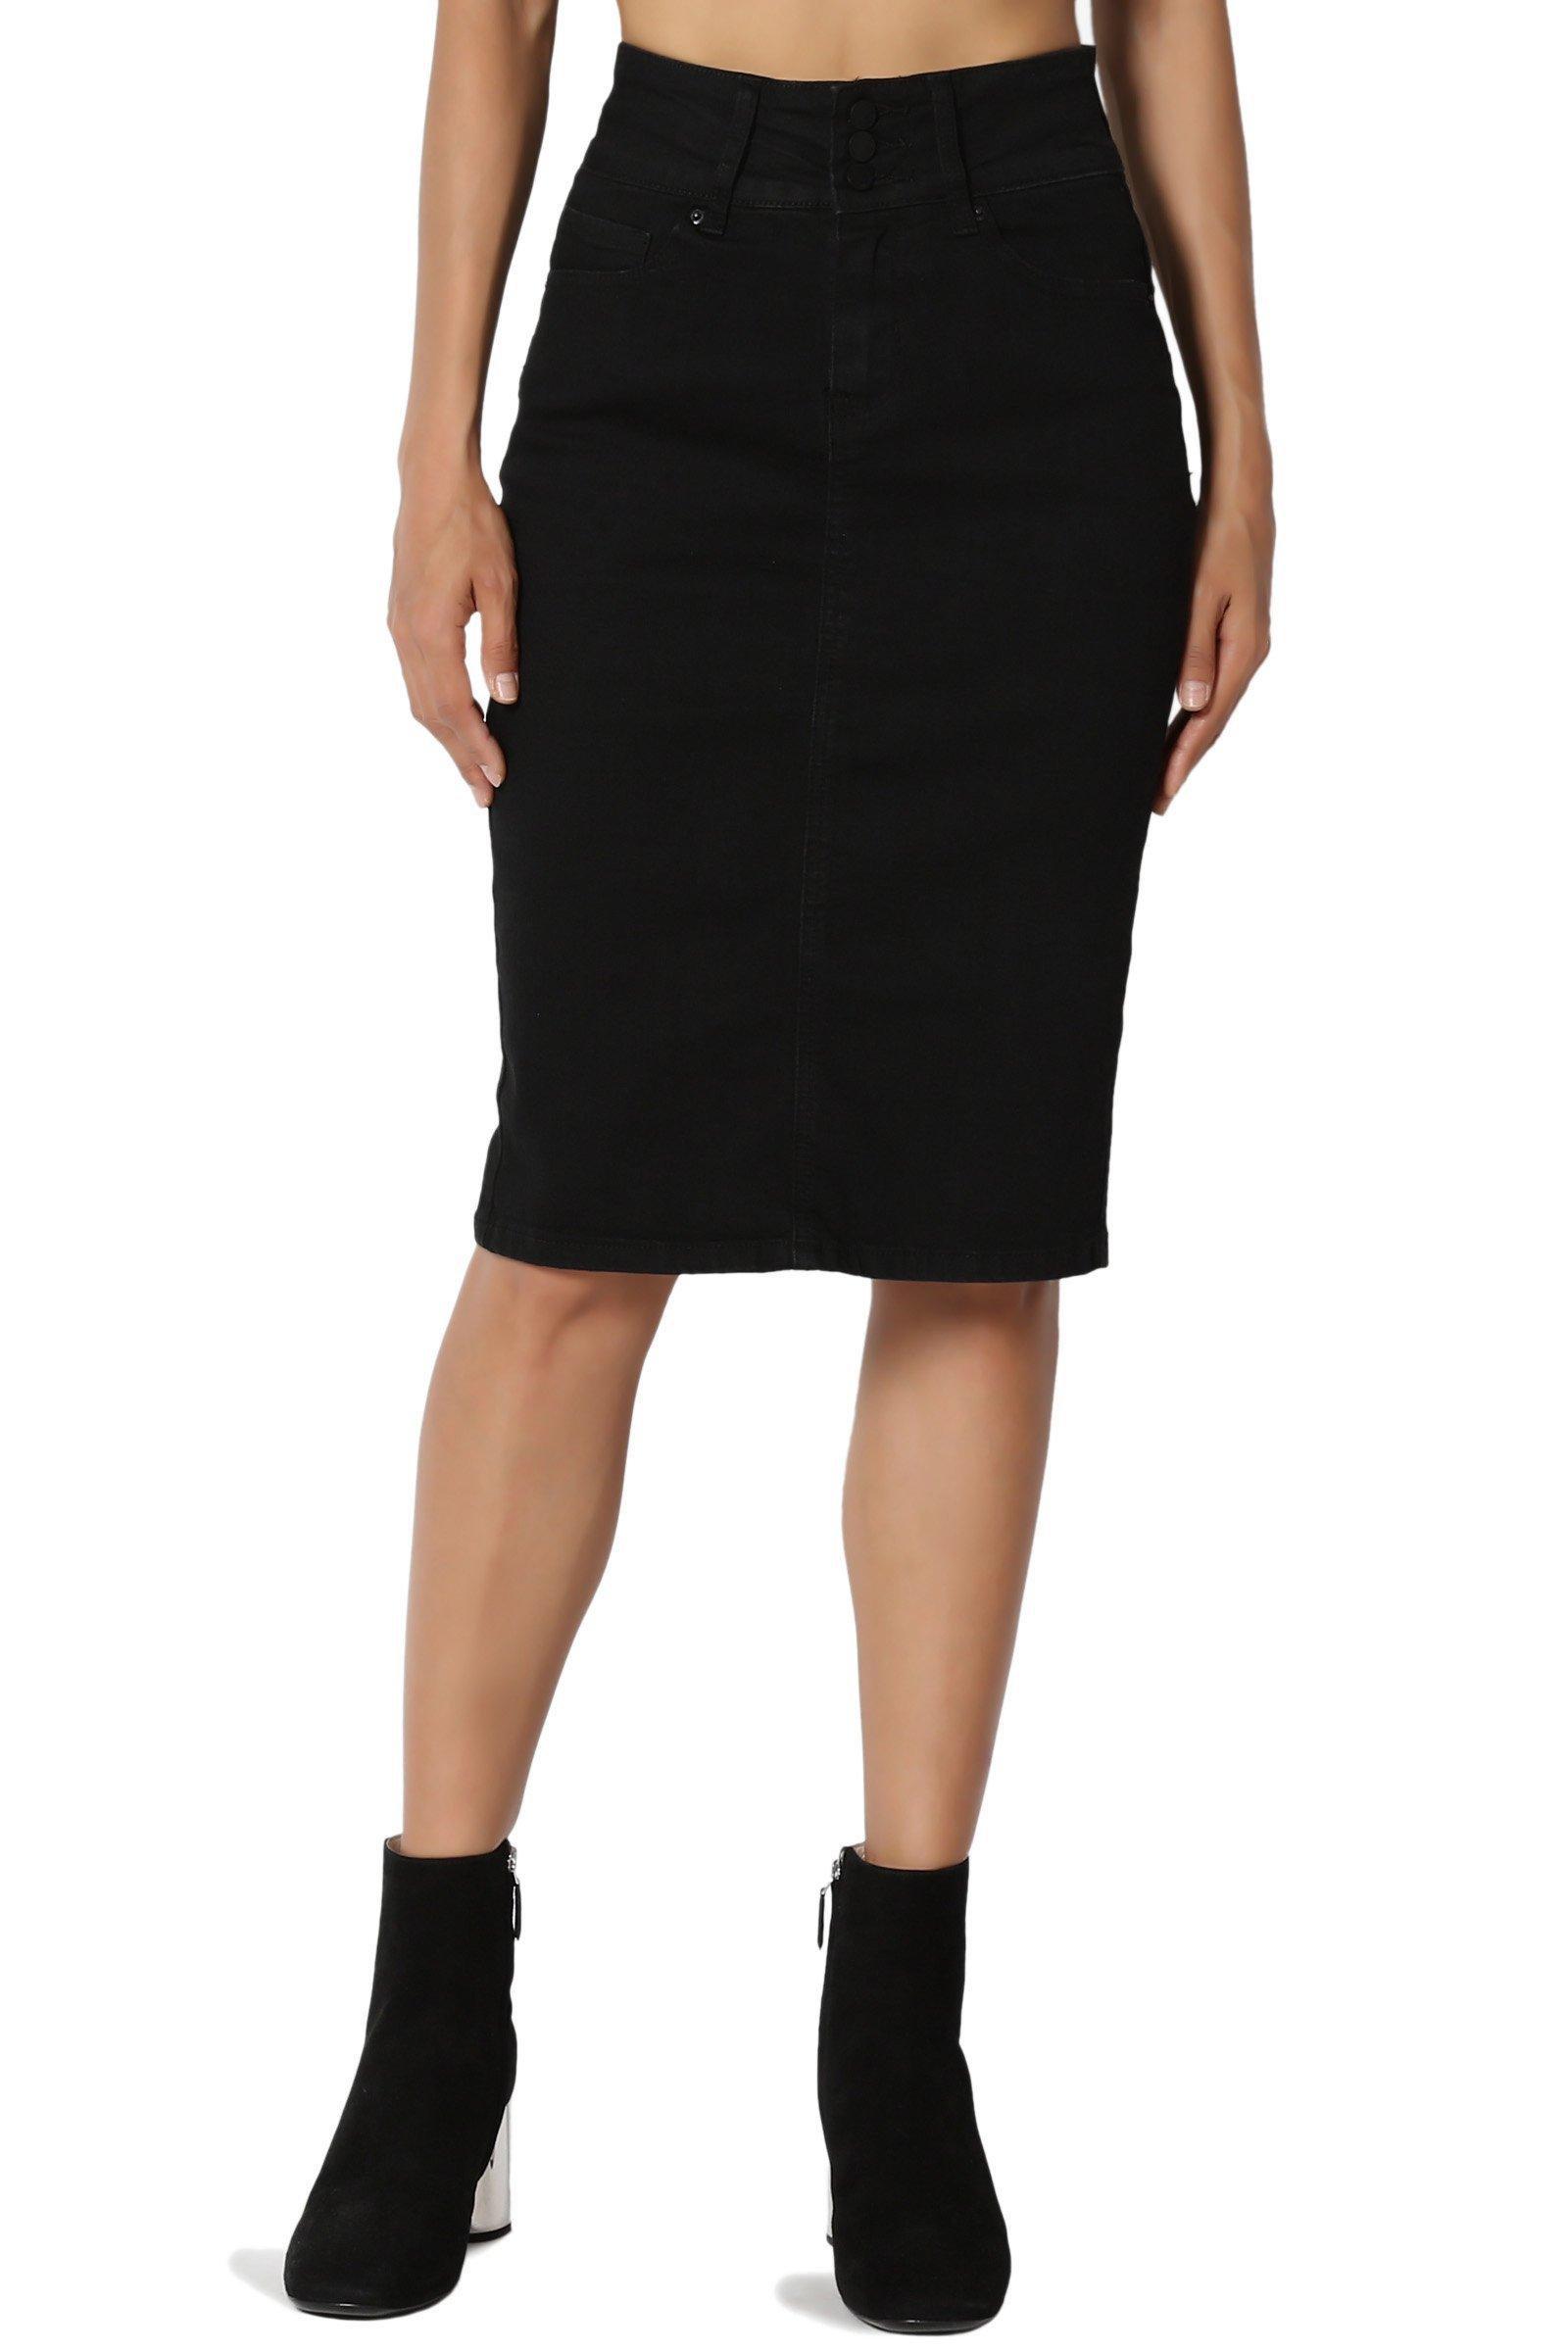 TheMogan Women's Butt Lift Indigo Pencil Knee Midi Stretch Denim Skirt Black M